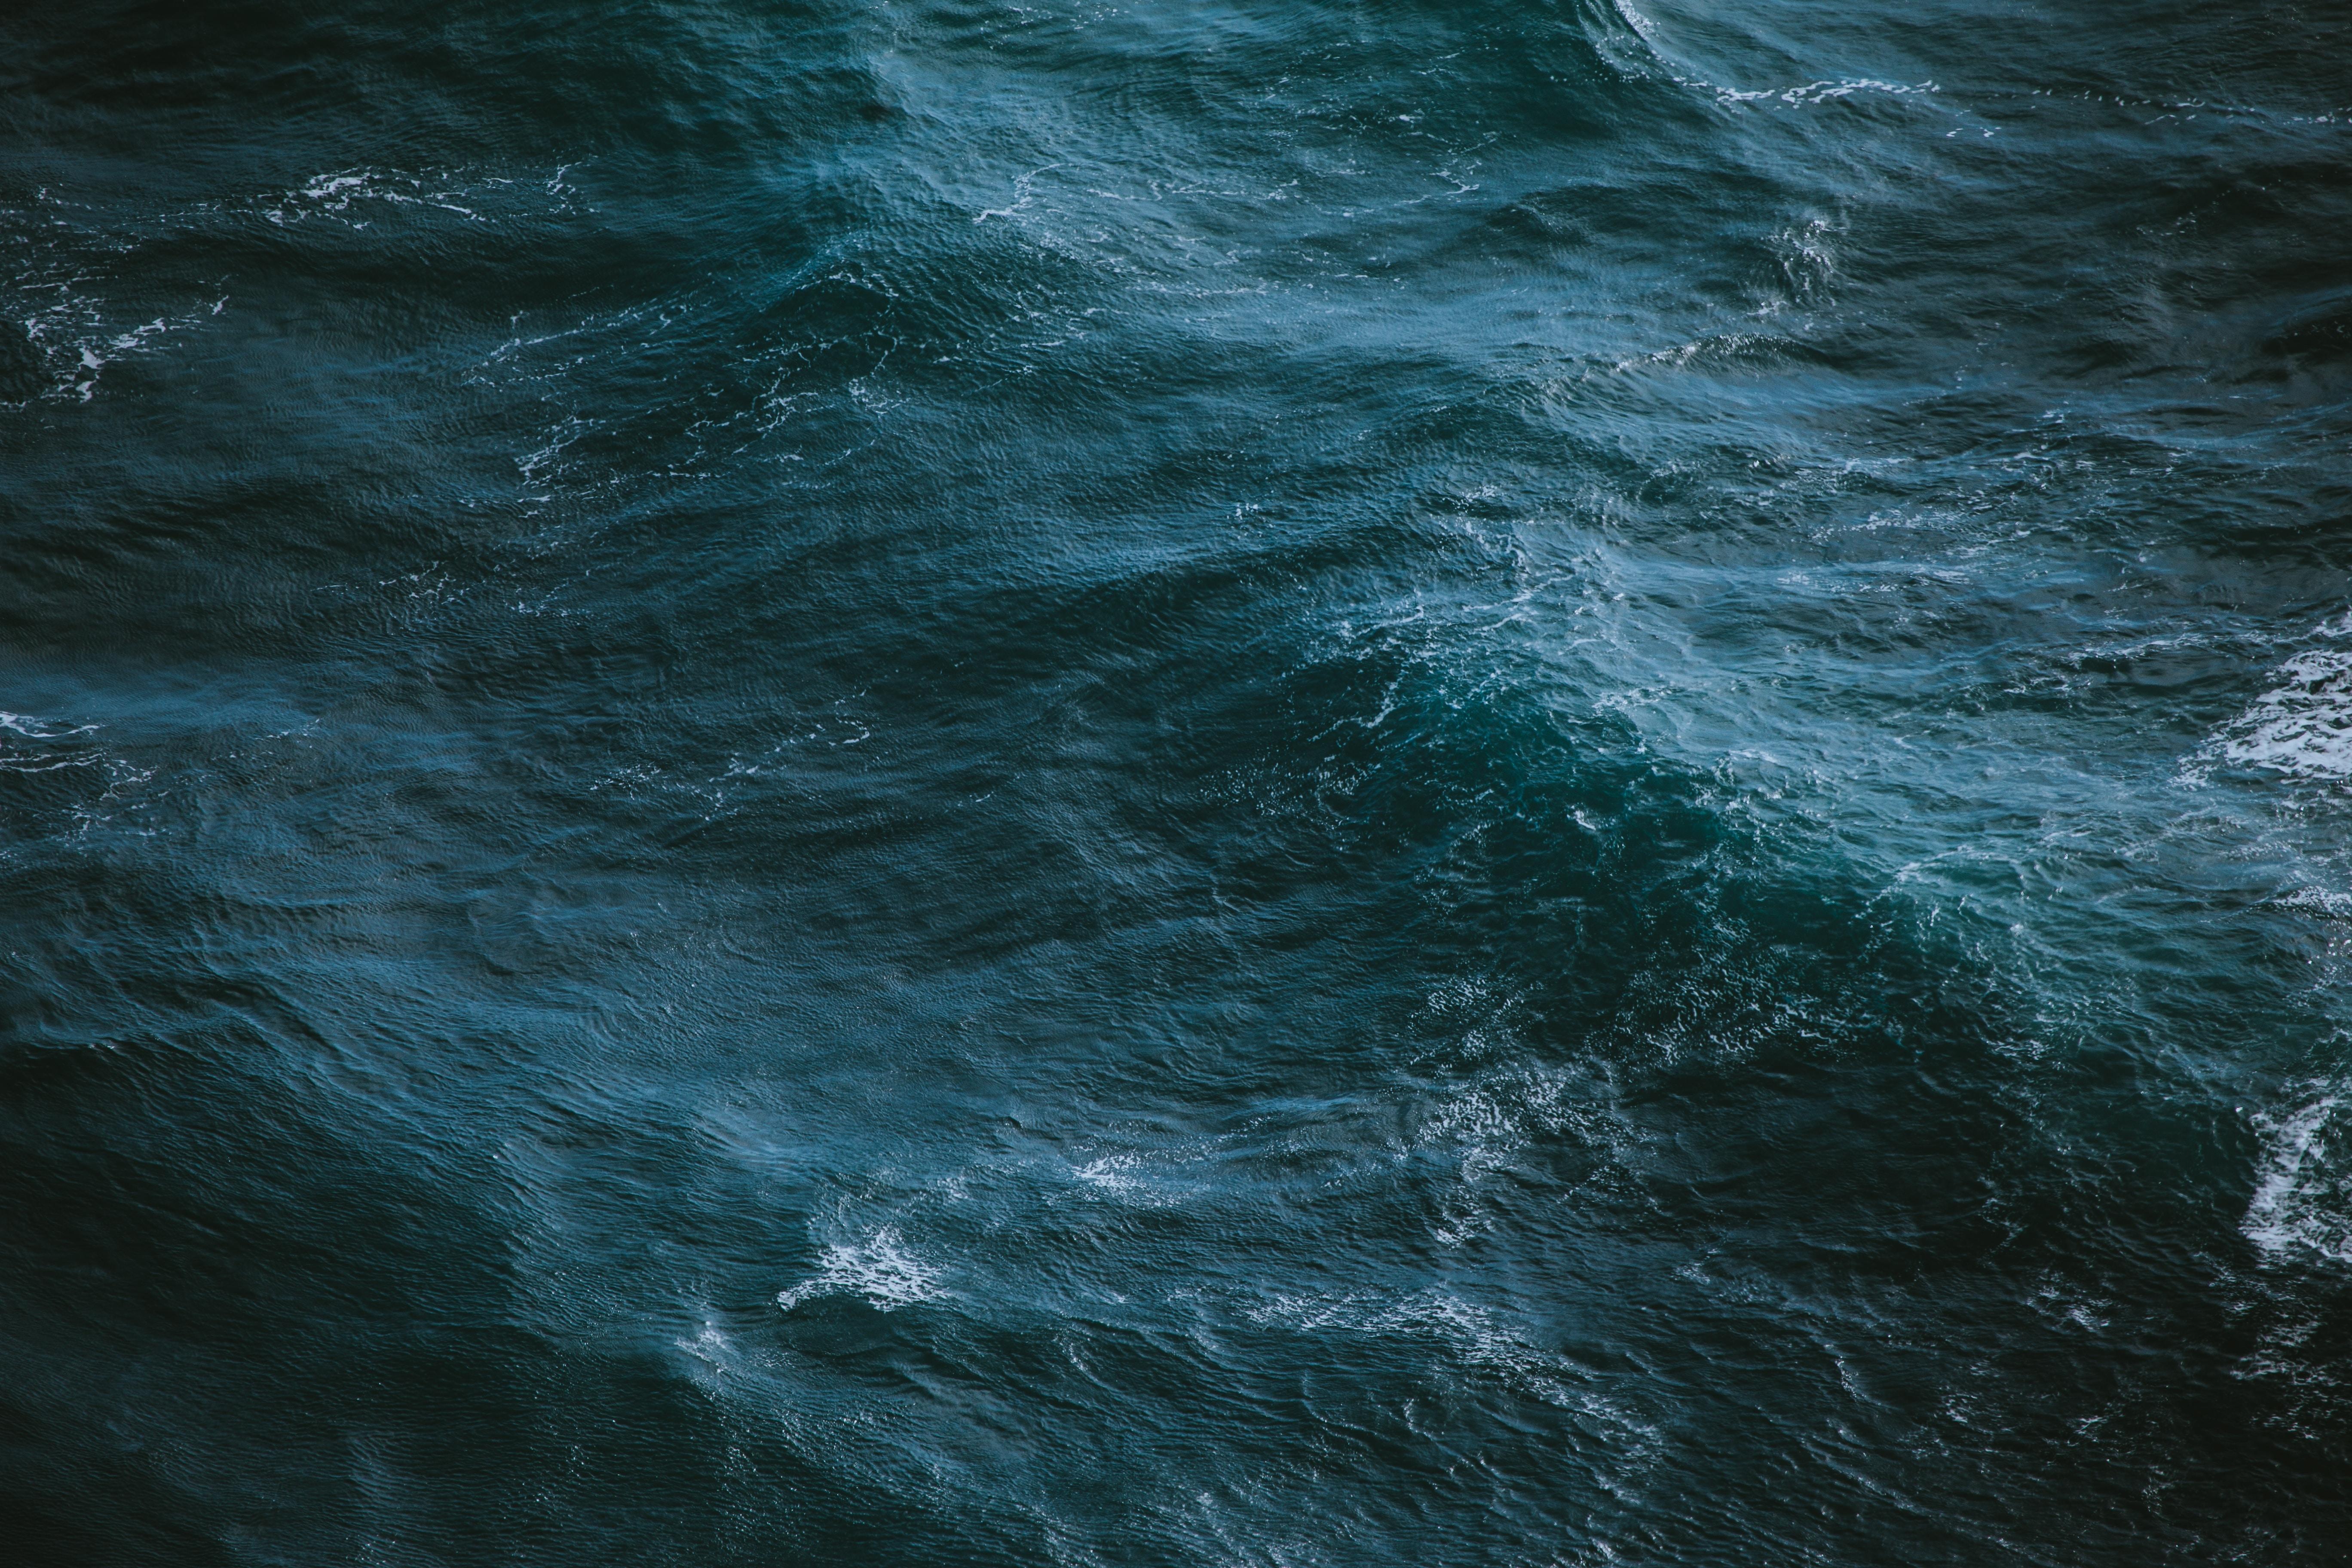 Nepper, Schlepper Kapitäne – Der Wahnsinn Um Die Seenotschlepper